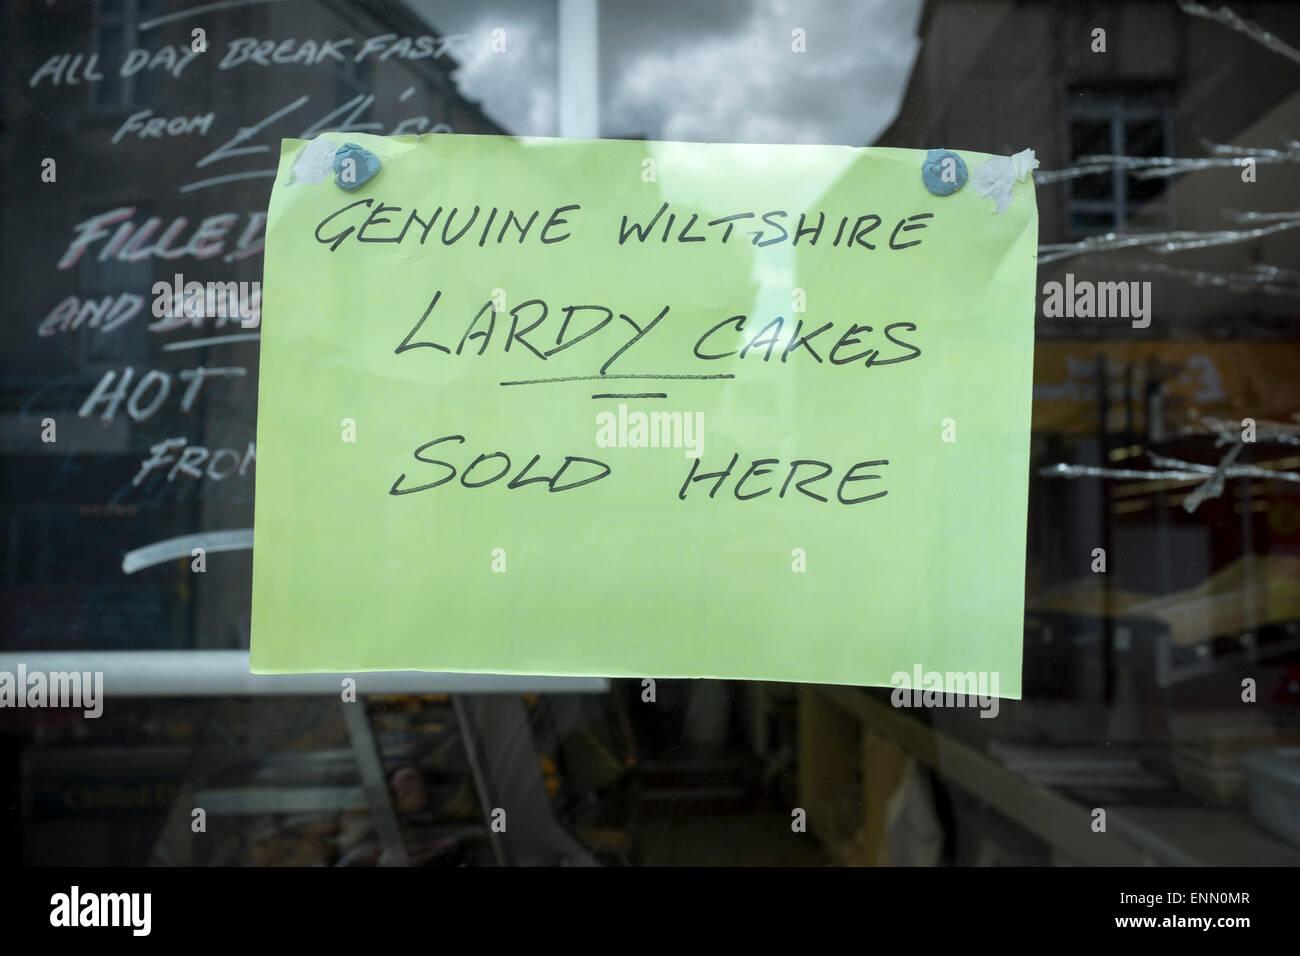 Bakery Shop Window Sign Advertising Genuine Wiltshire Lardy Cakes